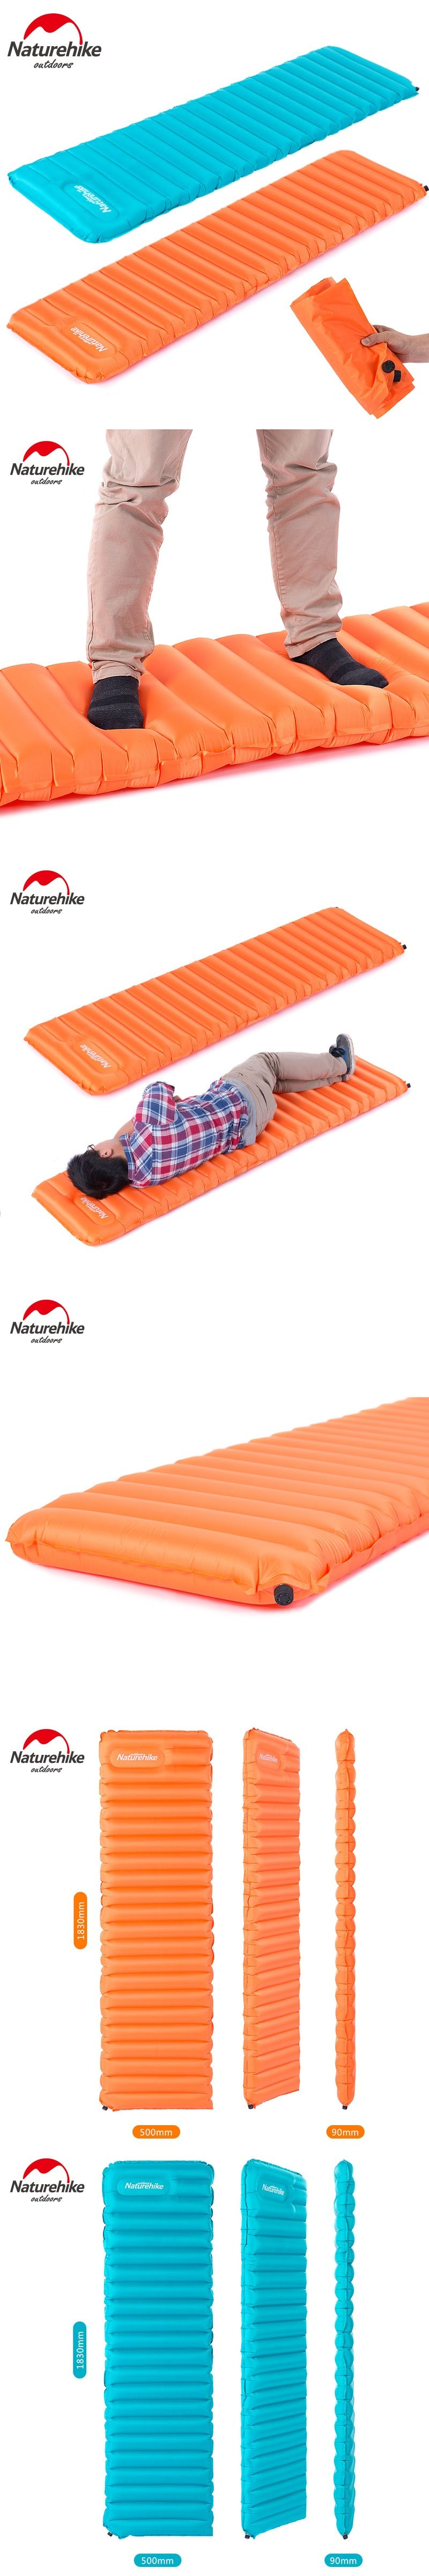 naturehike new 570g manually inflatable cushion camping mat tent air